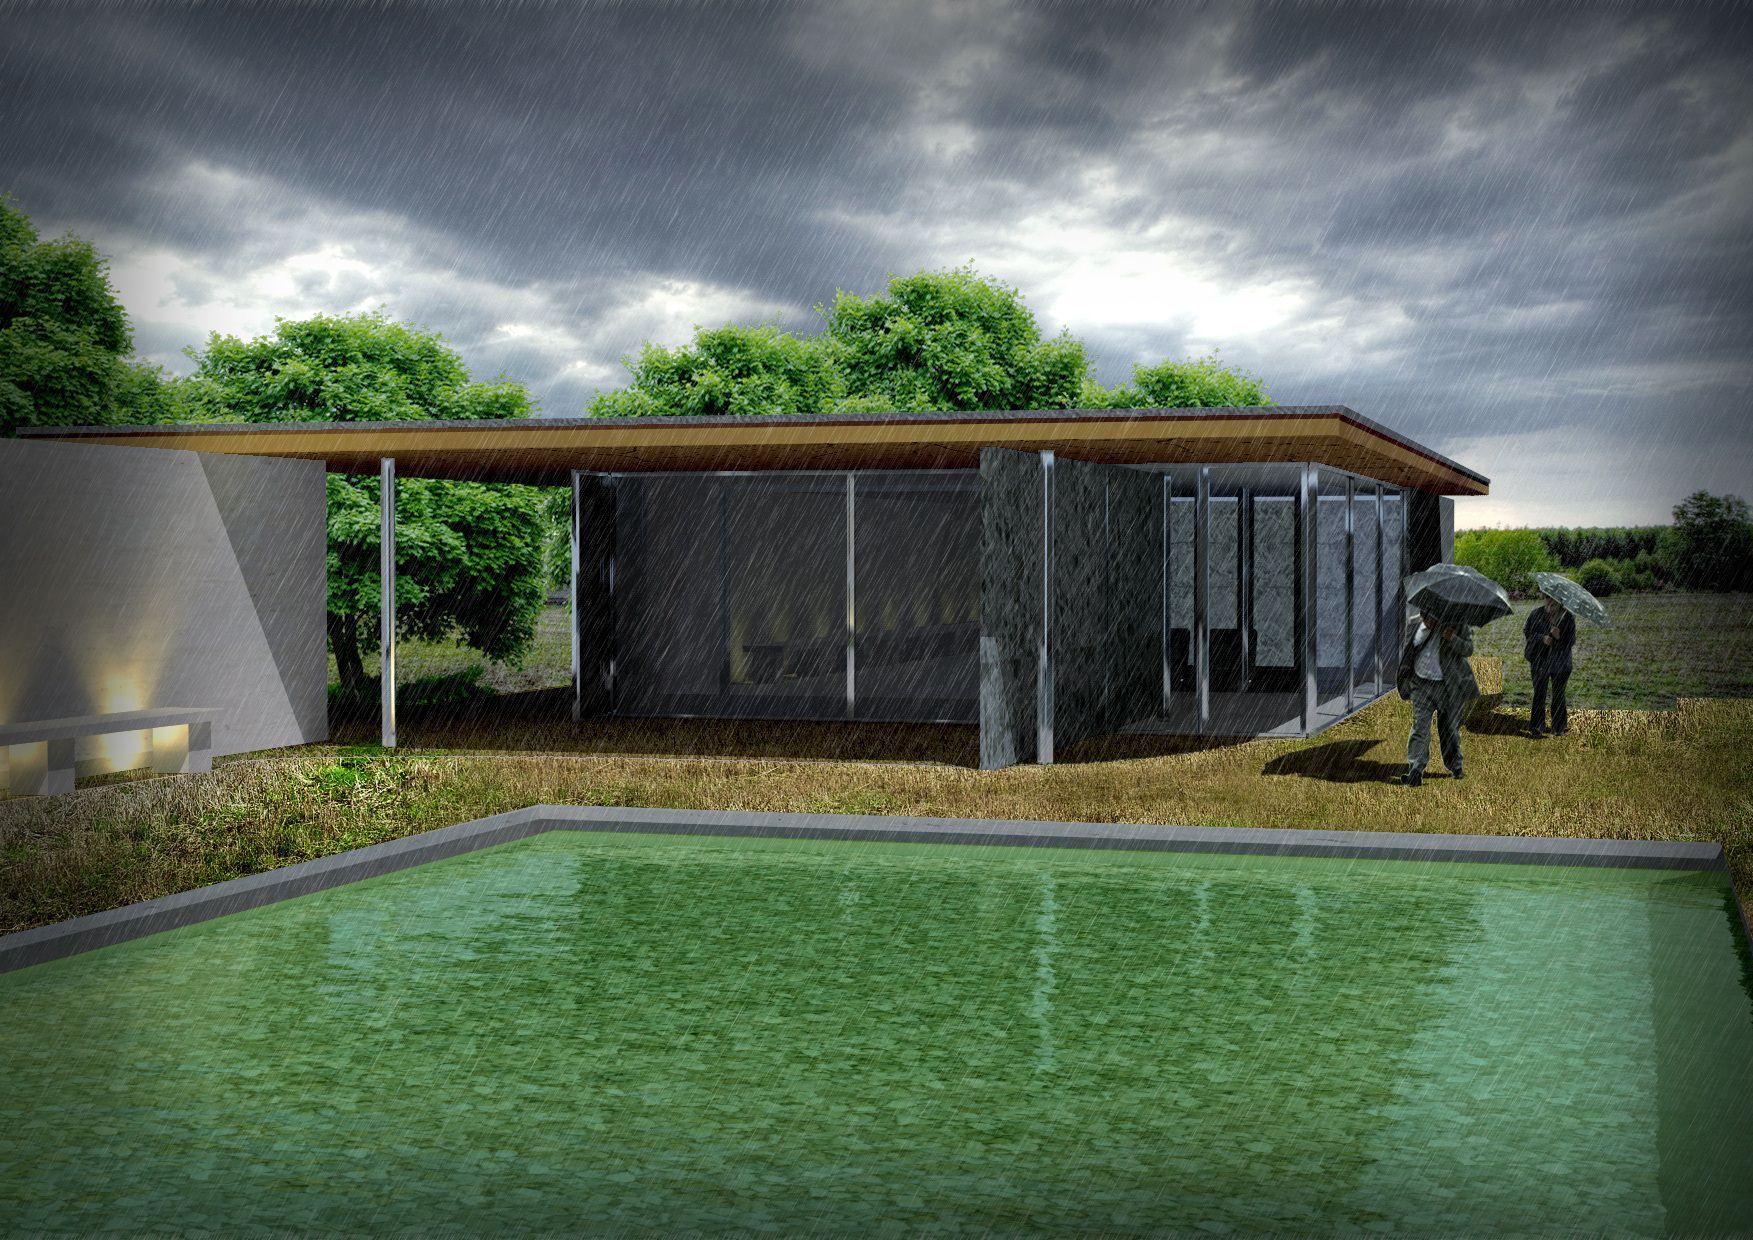 Barcelona pavilion exterior - Barcelona Pavilion 3d Model 3d Model Max 1